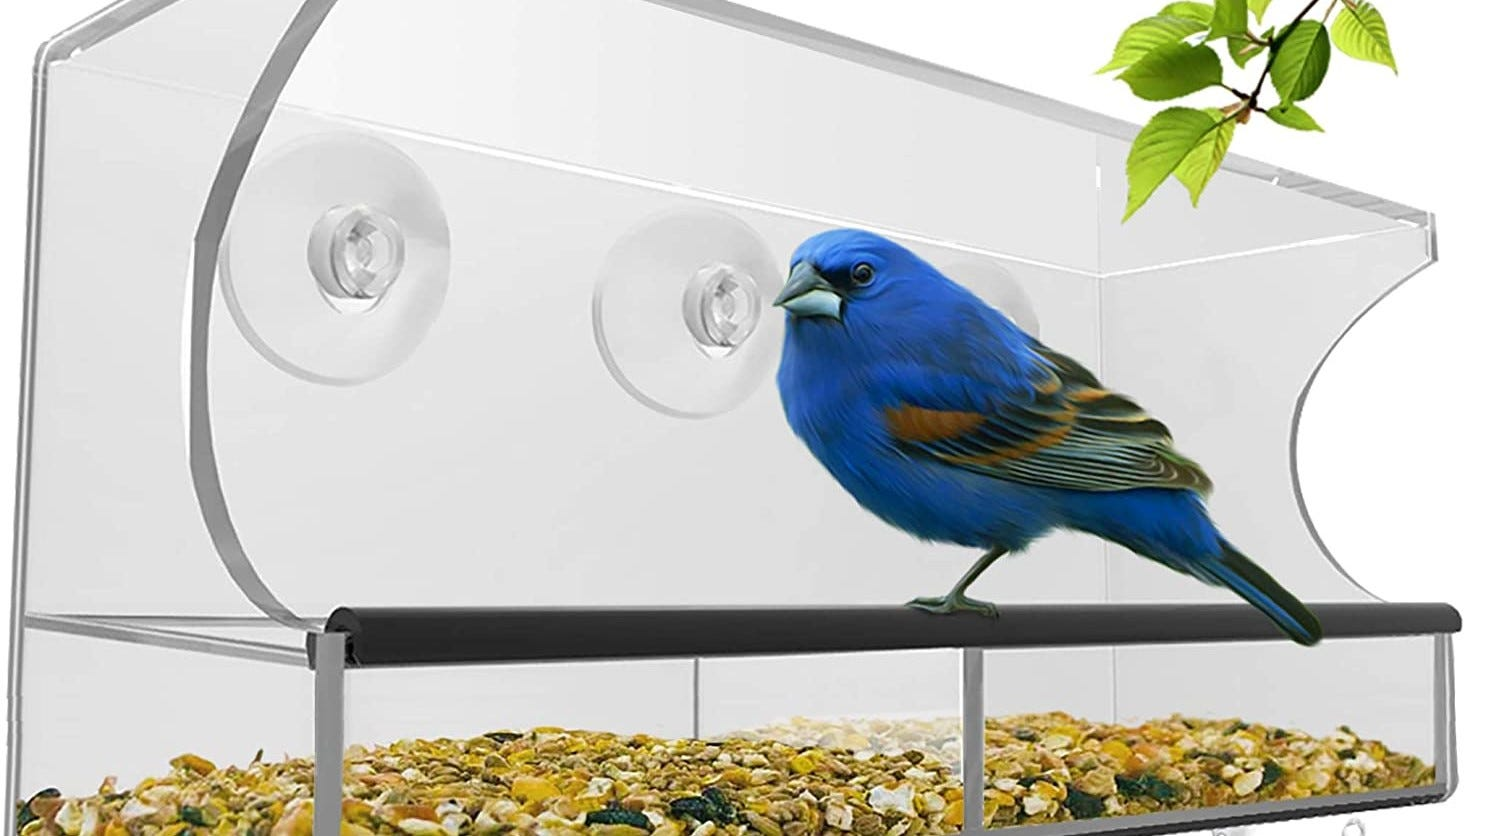 Window bird feeder with a bird on it.